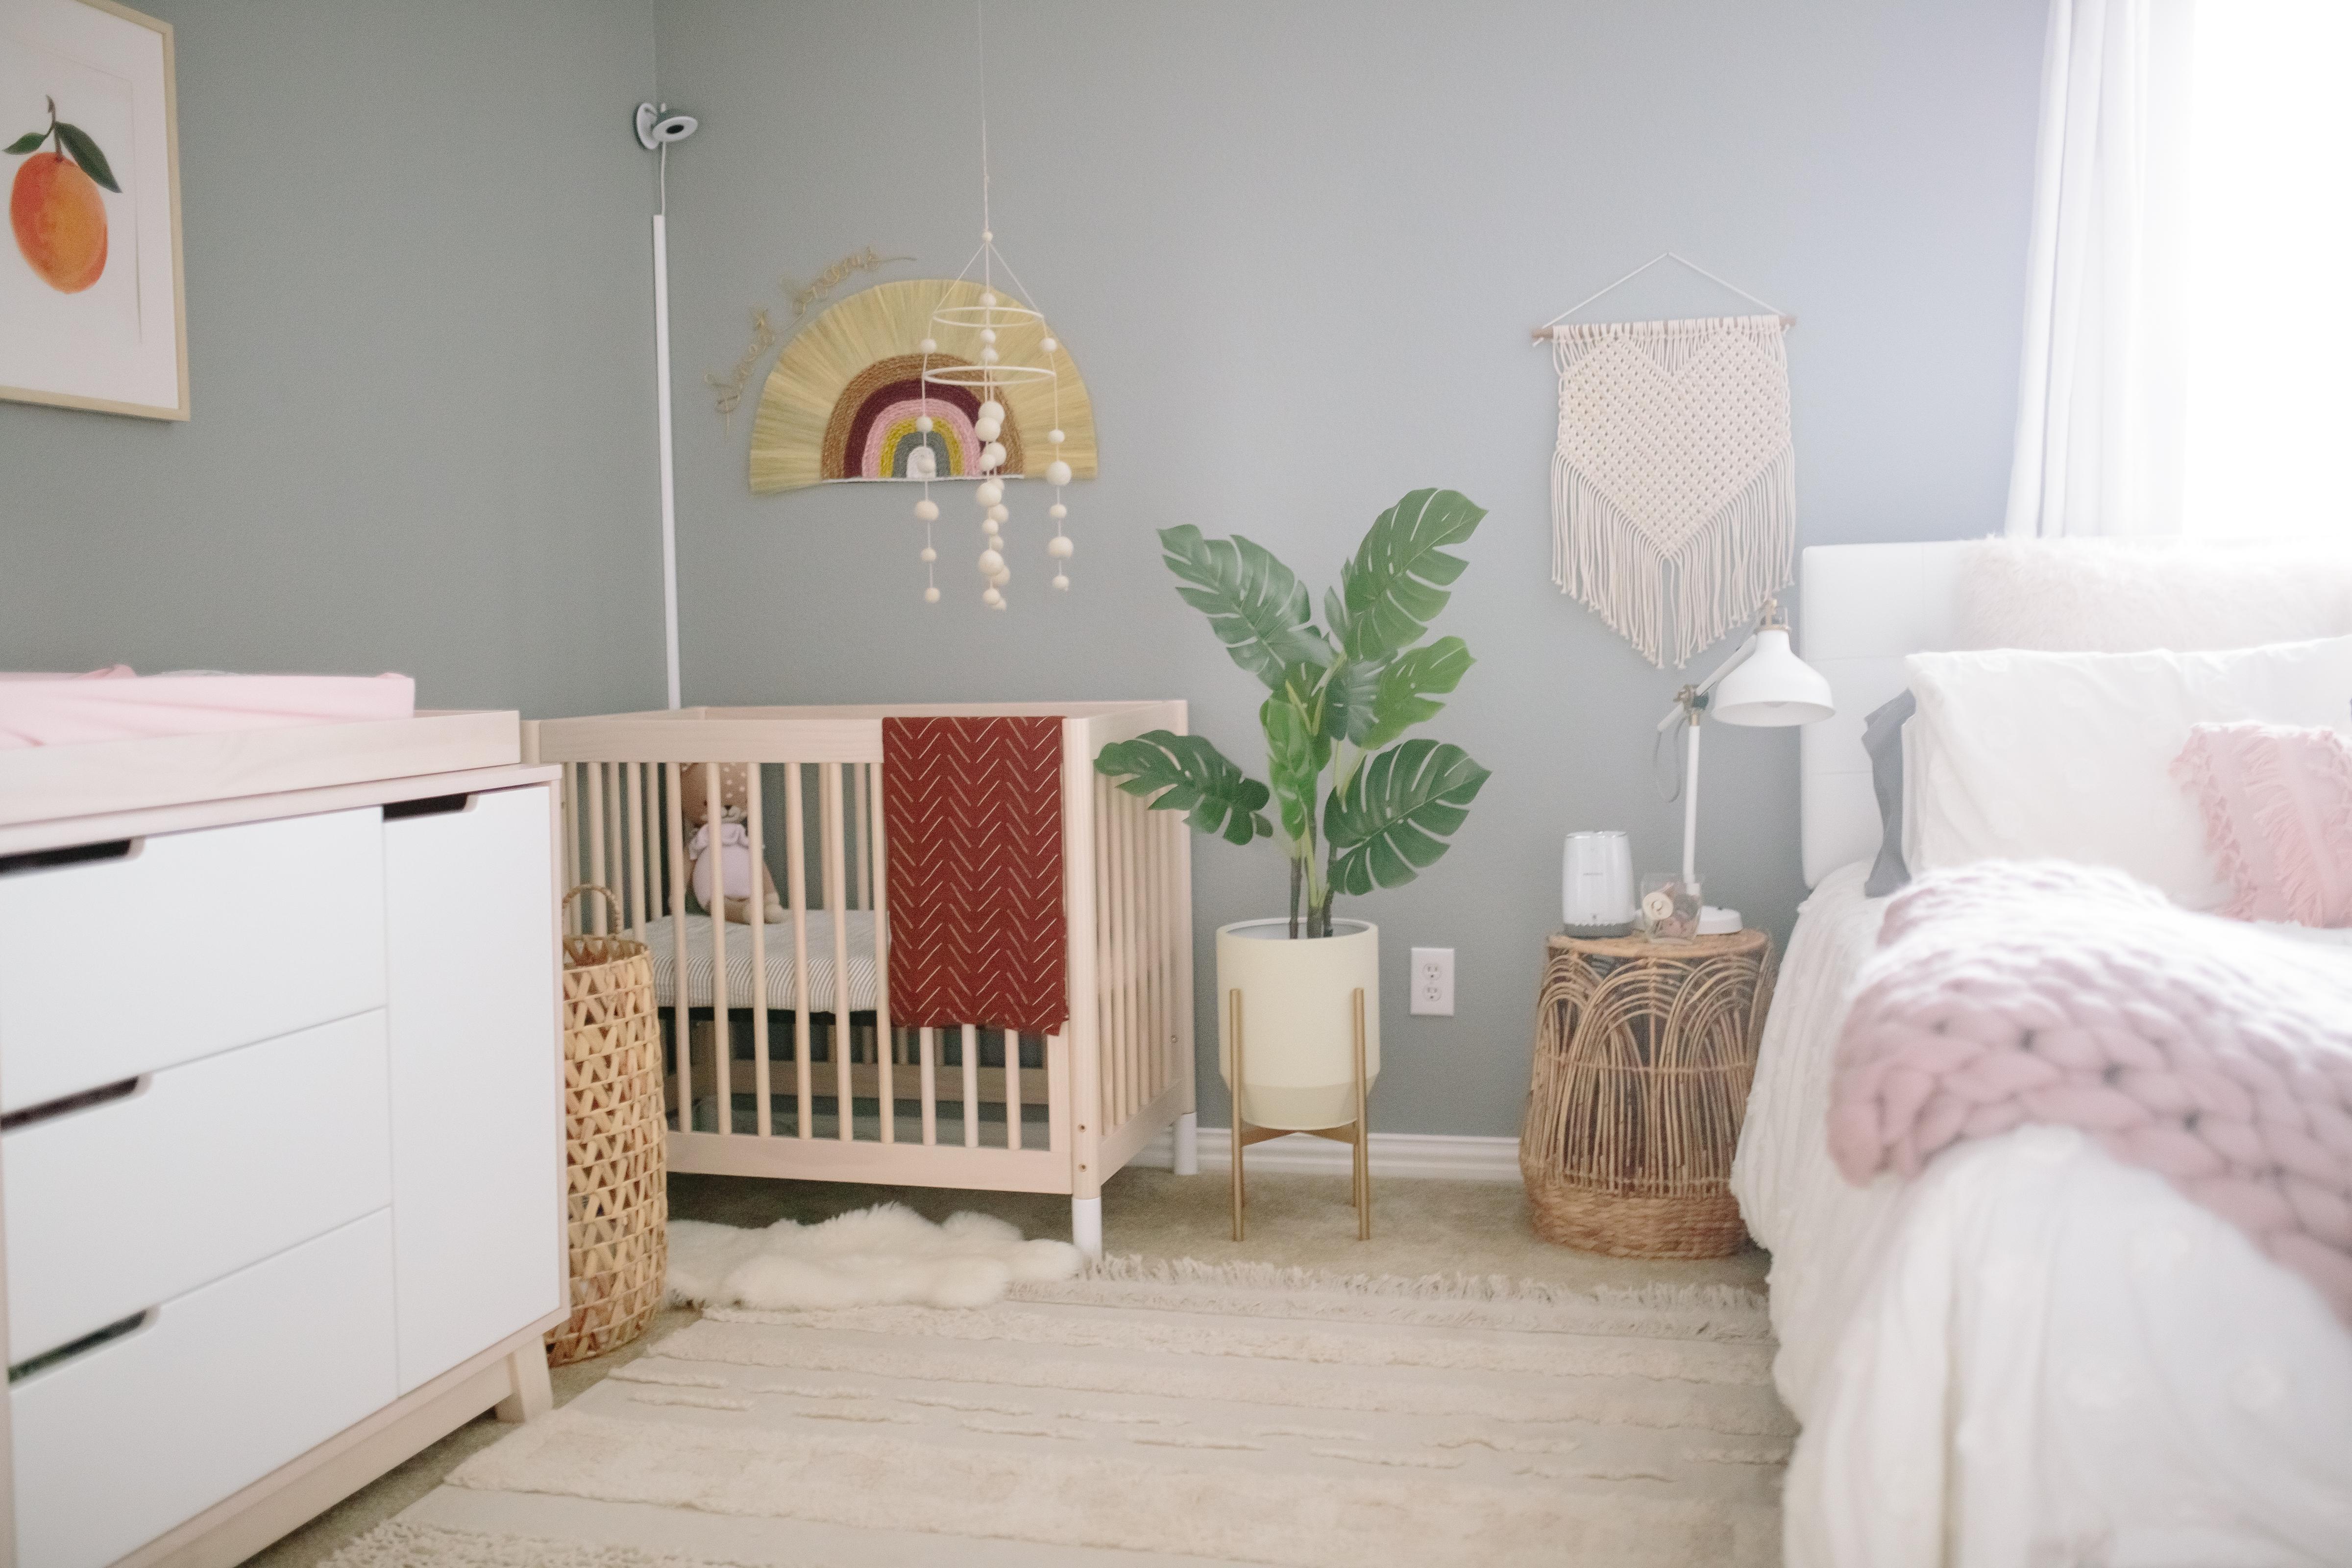 Boho Rainbow Nursery Nook in a Guest Room